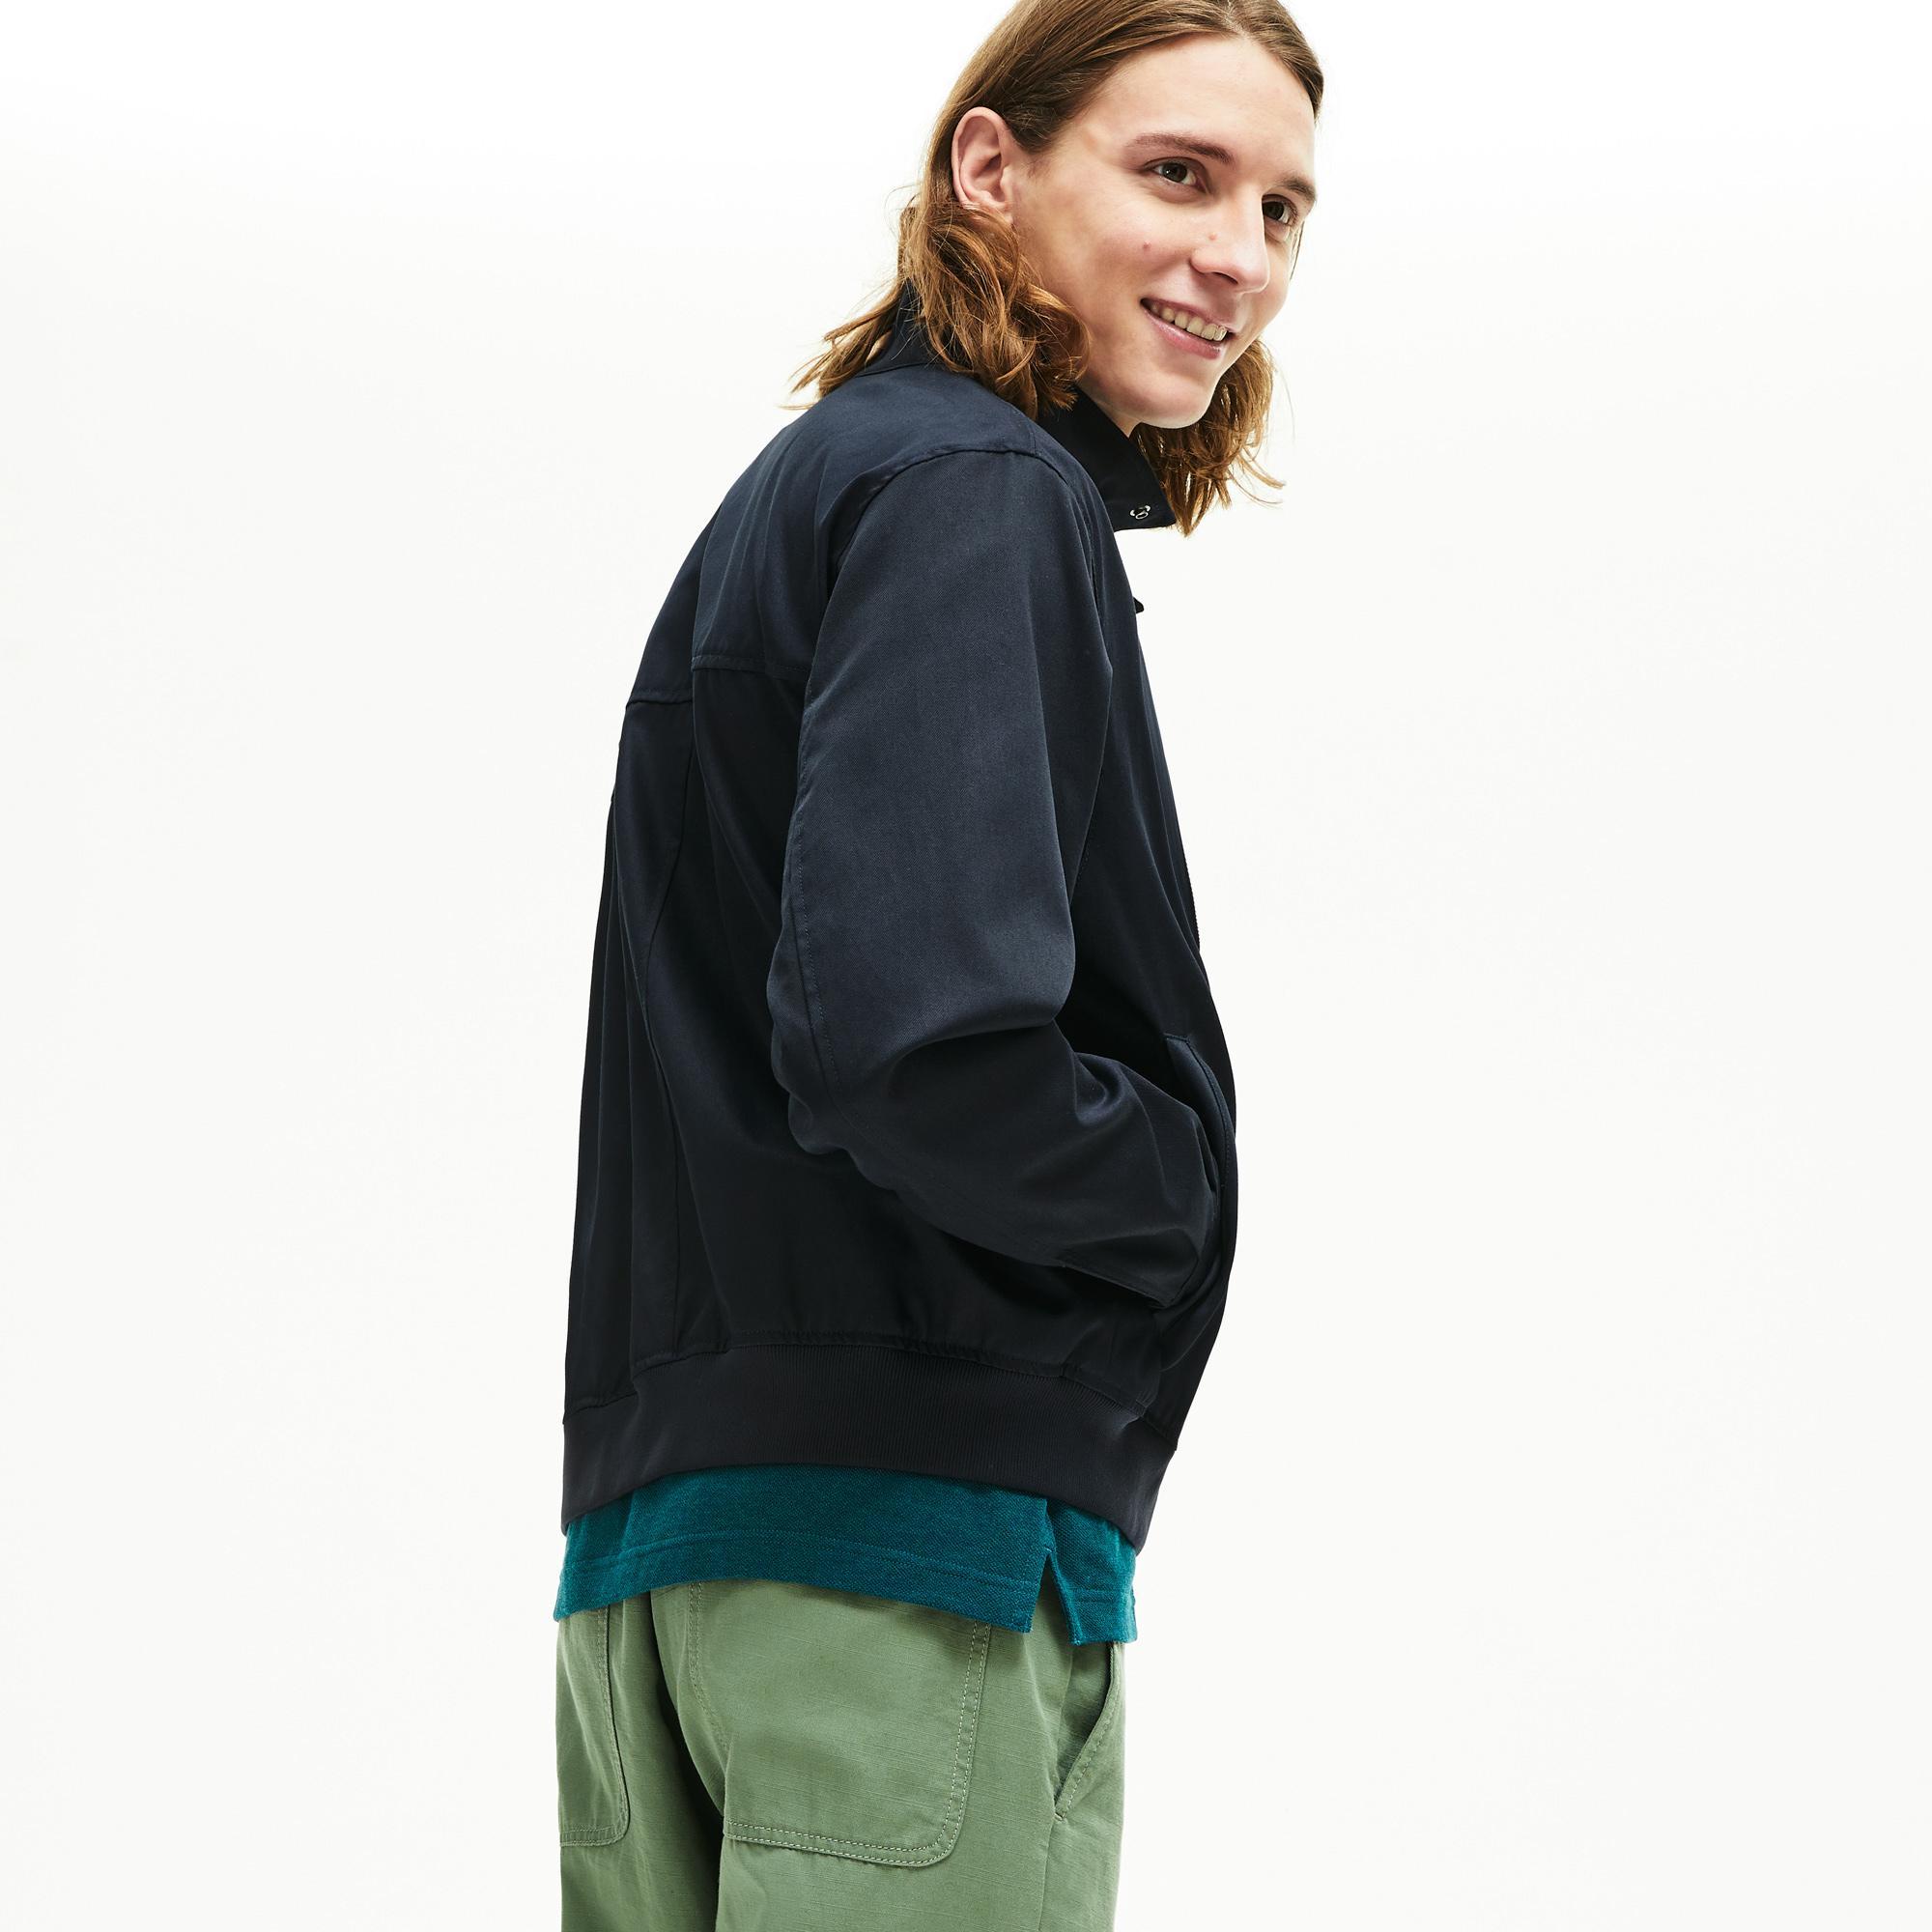 Lacoste Men's Lightweight Cotton Zip Harrington Jacket